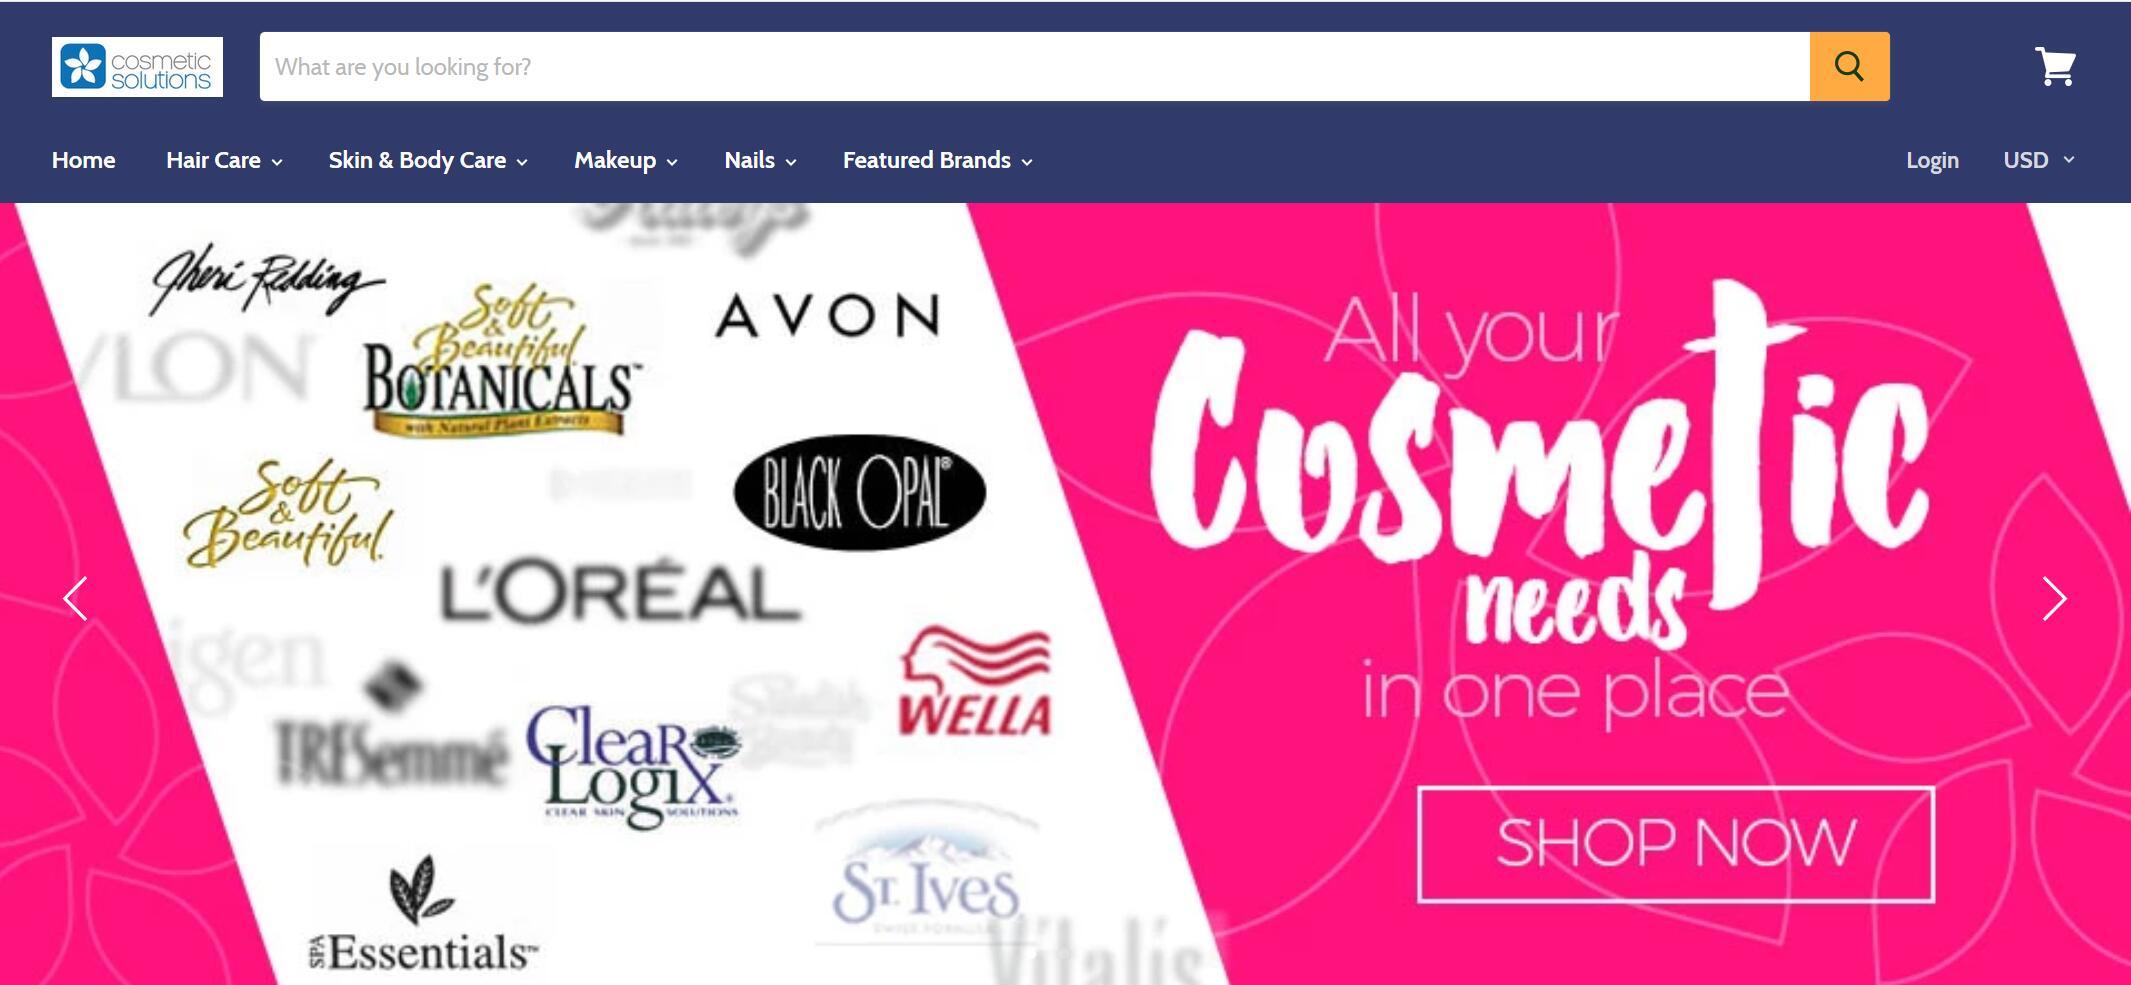 "LVMH 集团为""美妆初创""项目招聘管理人才,或将推出全新环保概念品牌"